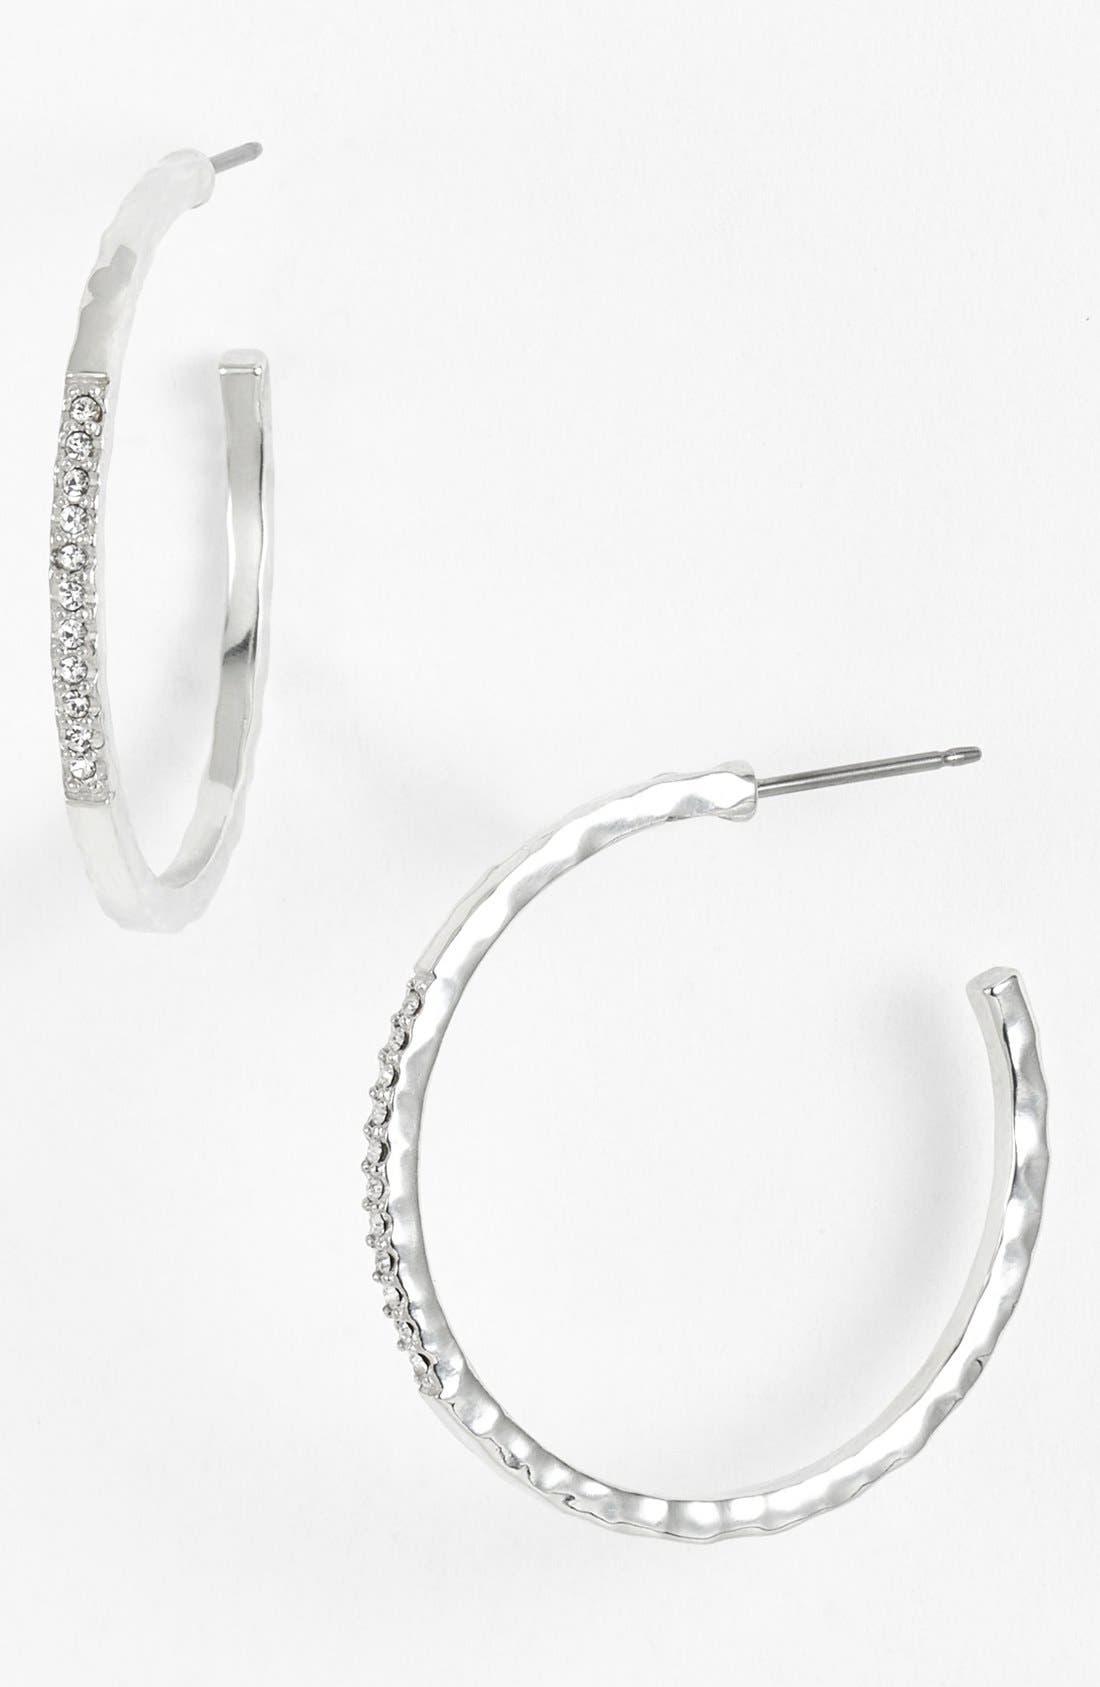 Main Image - Judith Jack 'Oval Essence' Hoop Earrings